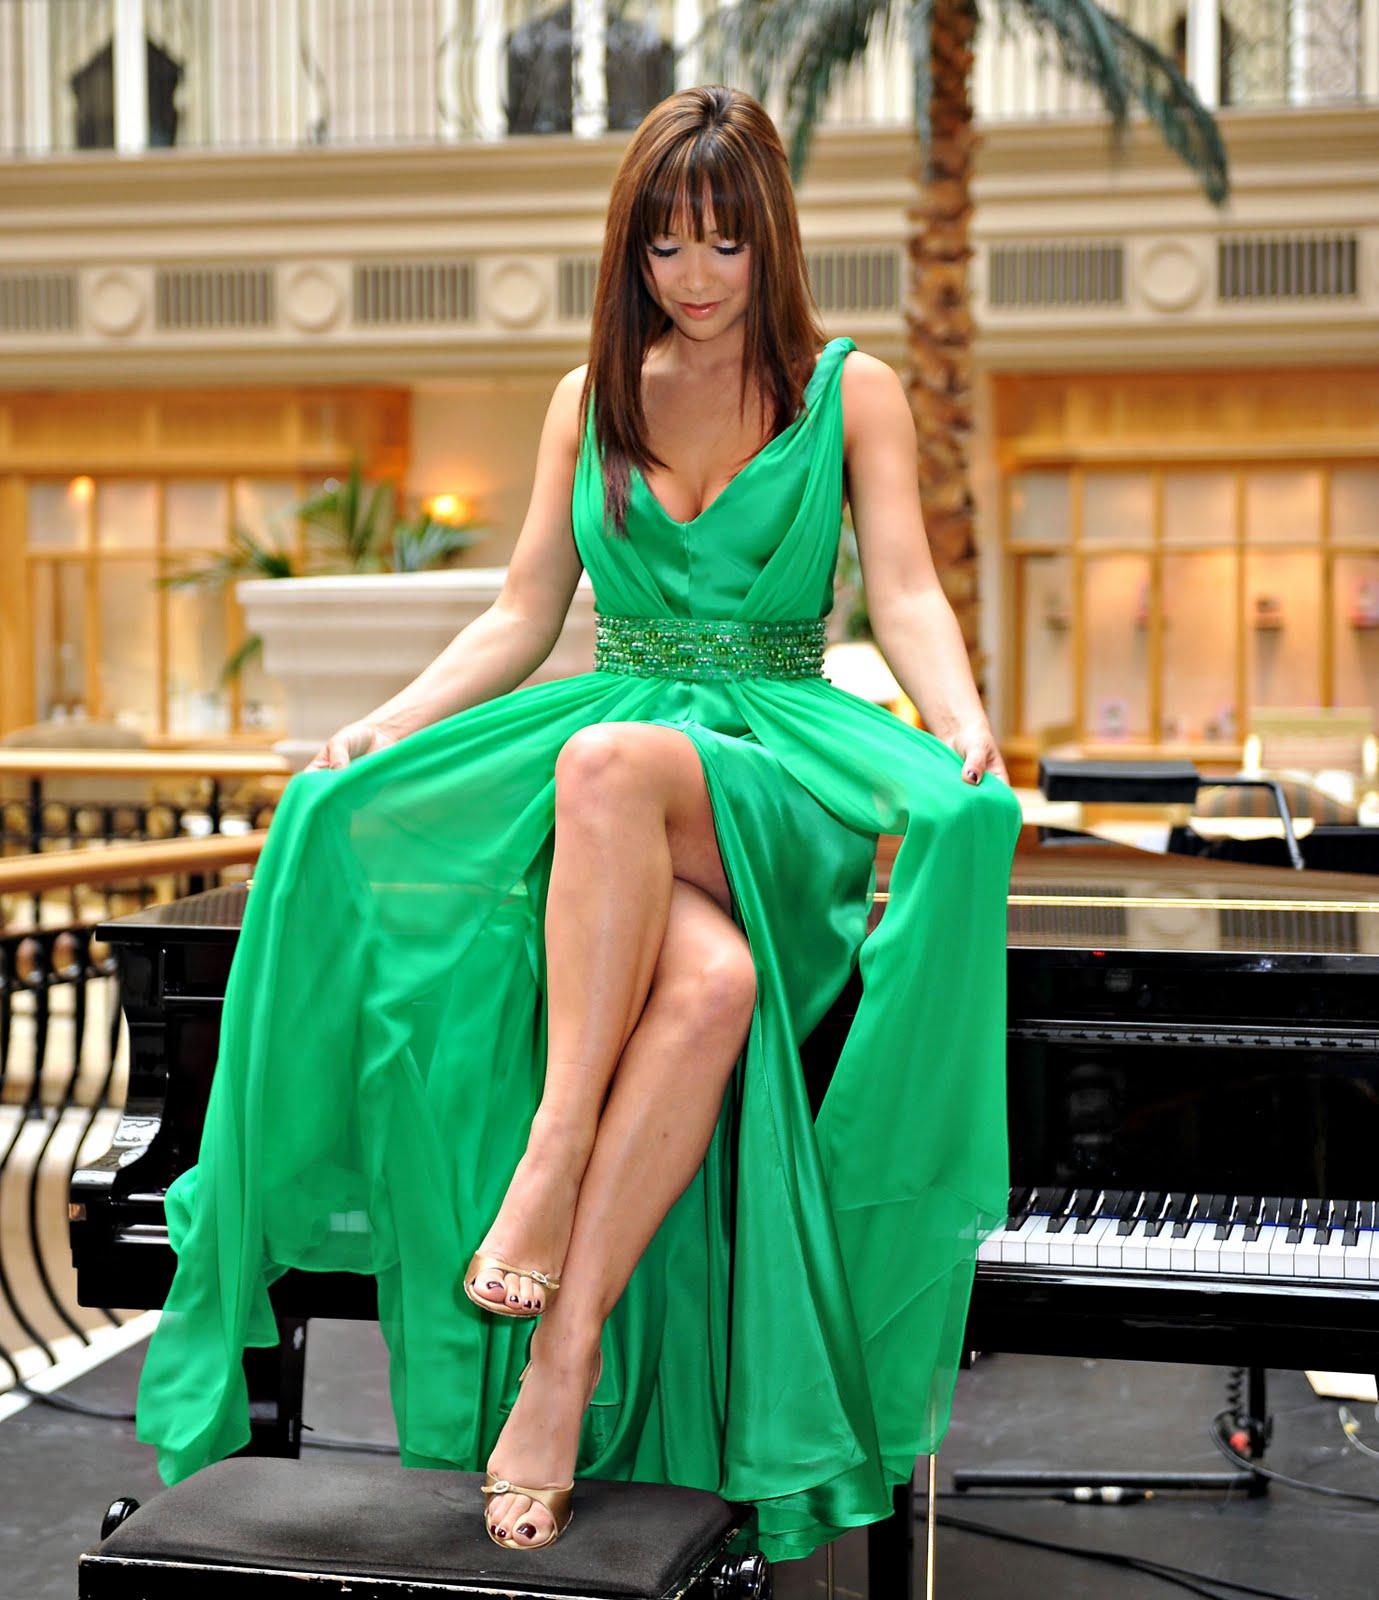 http://3.bp.blogspot.com/_UaLWp72nij4/TBKlJtuY0iI/AAAAAAAAOuA/LH5MQYV067w/s1600/myleene-klass-feet-3.jpg